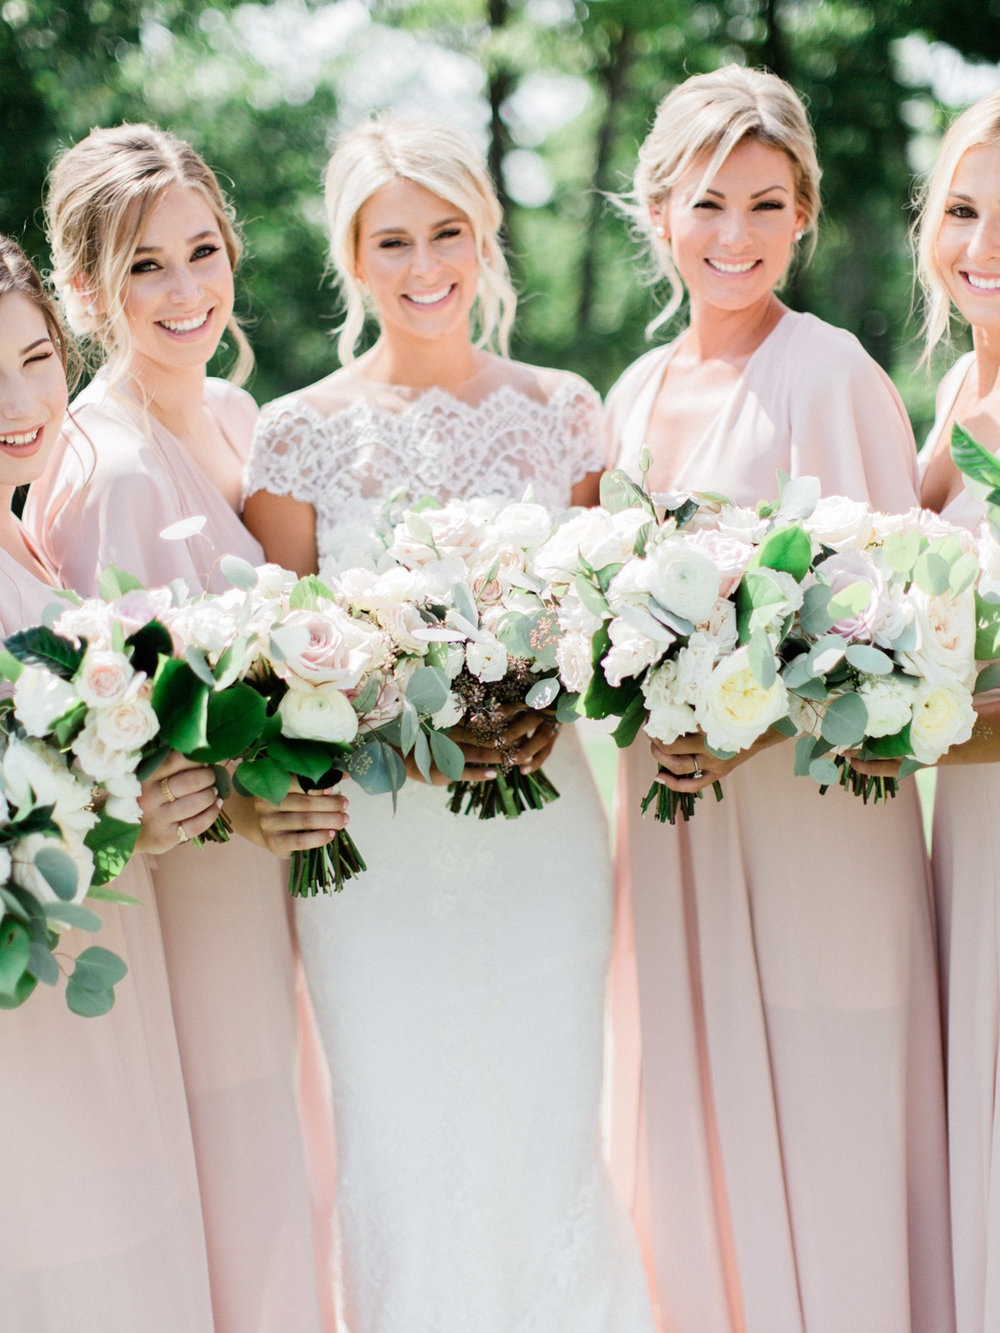 Toronto-Muskoka-wedding-photographer-summery-fun-documentary-the-marriott-rosseau41.jpg